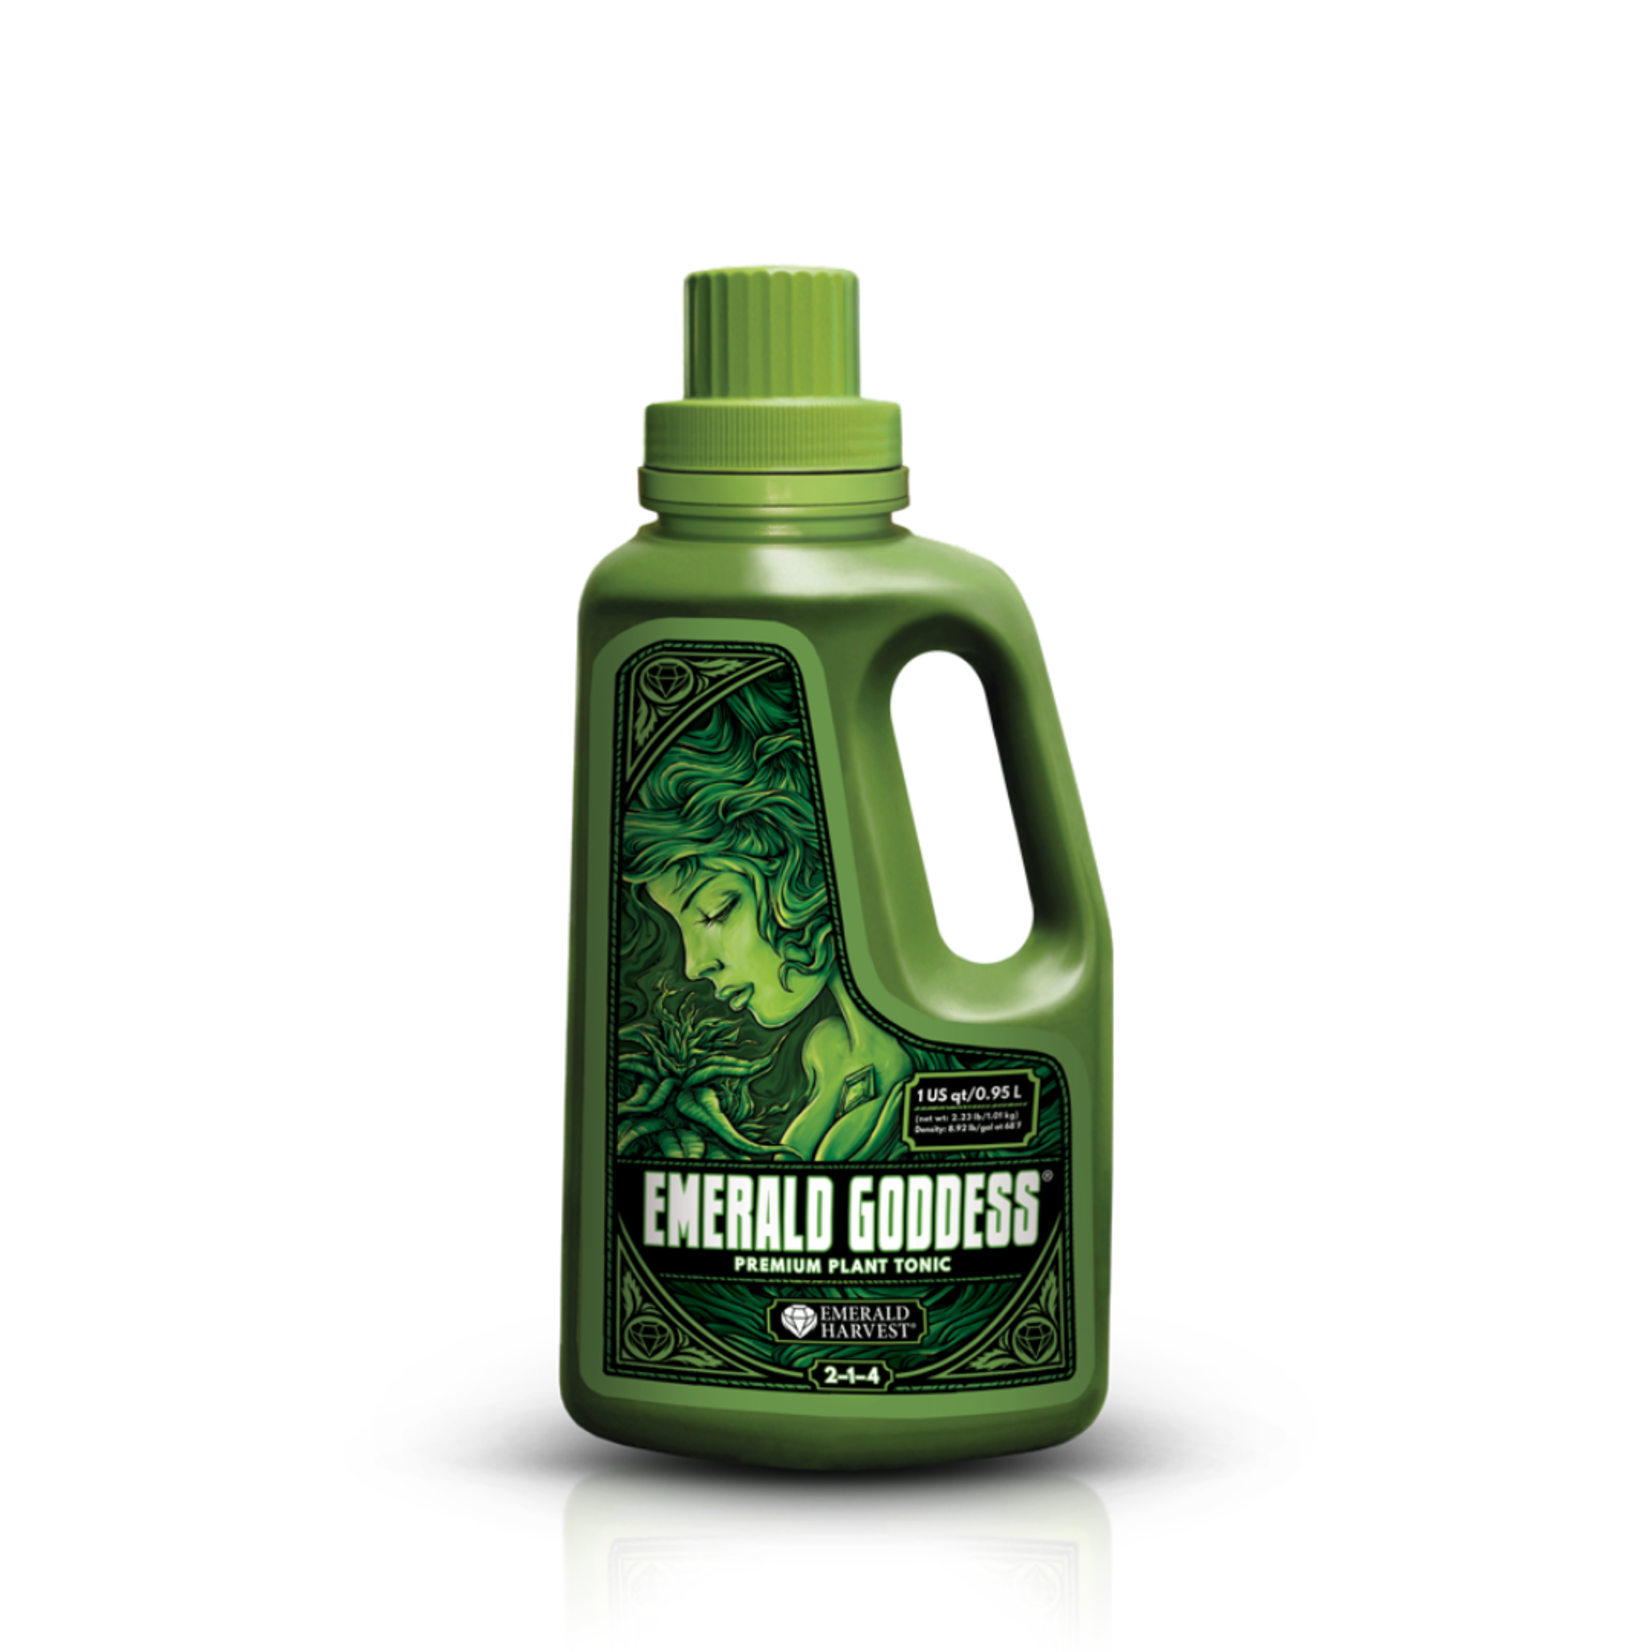 Emerald Harvest Emerald Harvest Emerald Goddess